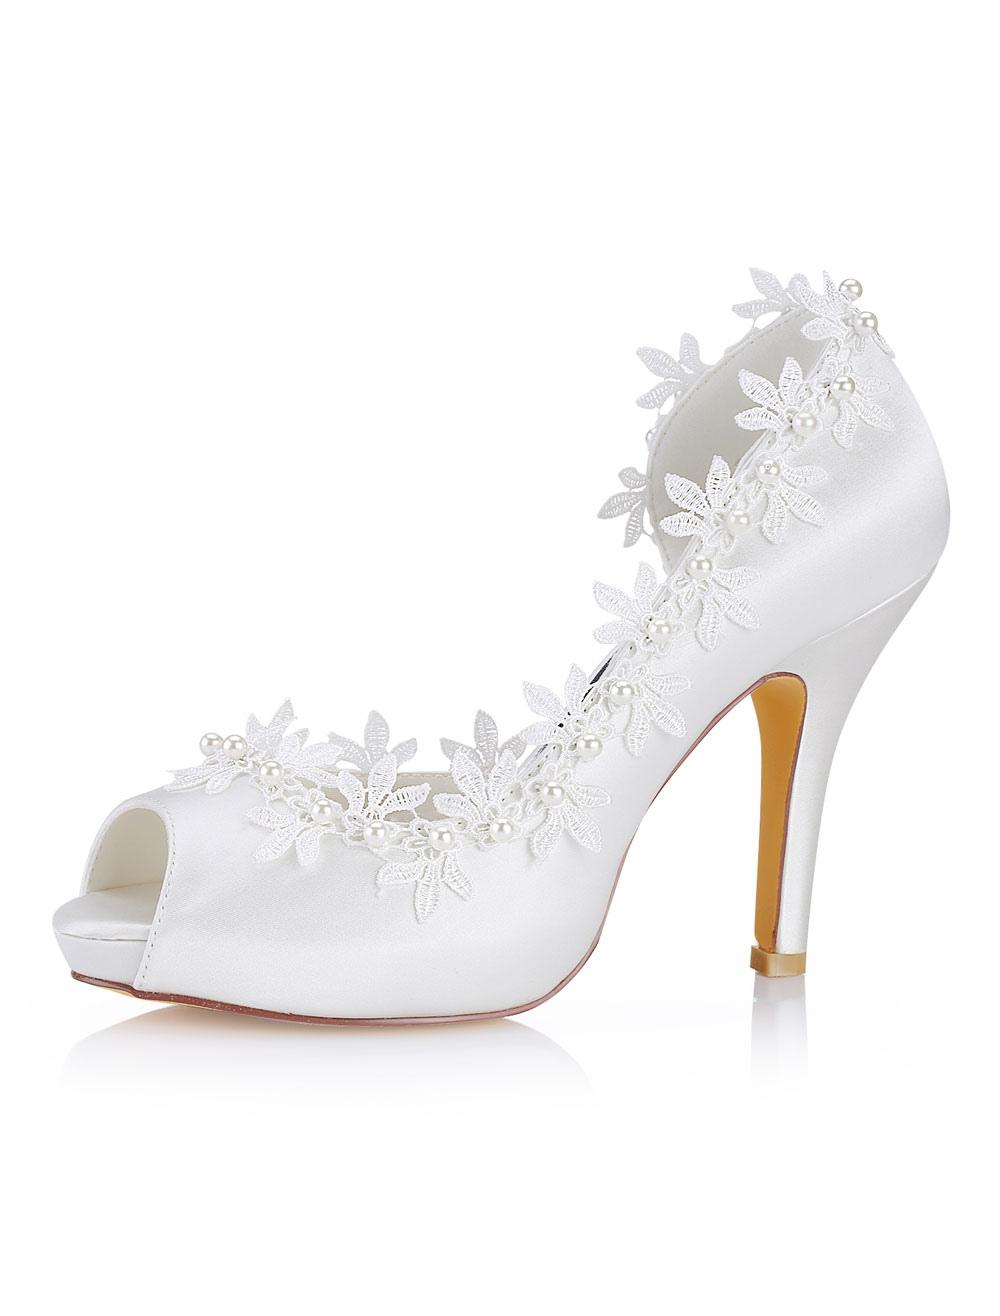 Ivory Wedding Shoes Silk Peep Toe Lace Detail Bridal Shoes Women High Heels